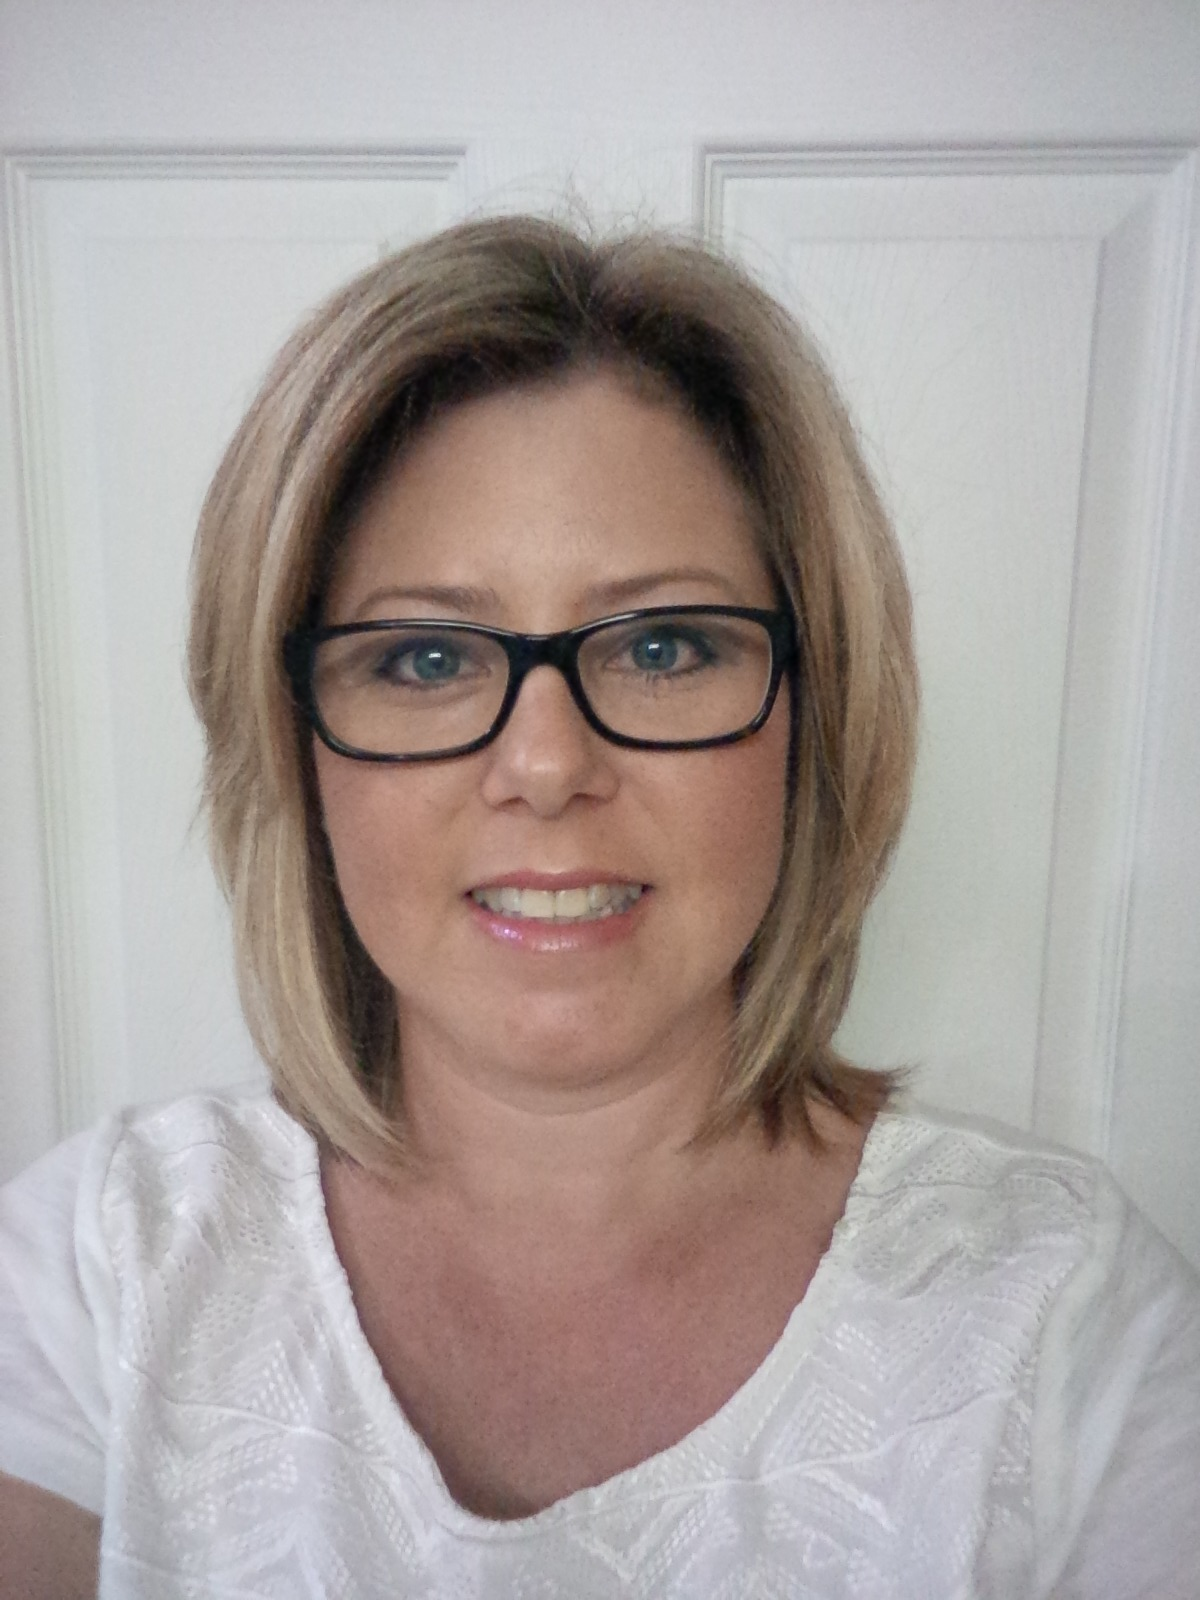 Twila MacDonald - Food Services Director